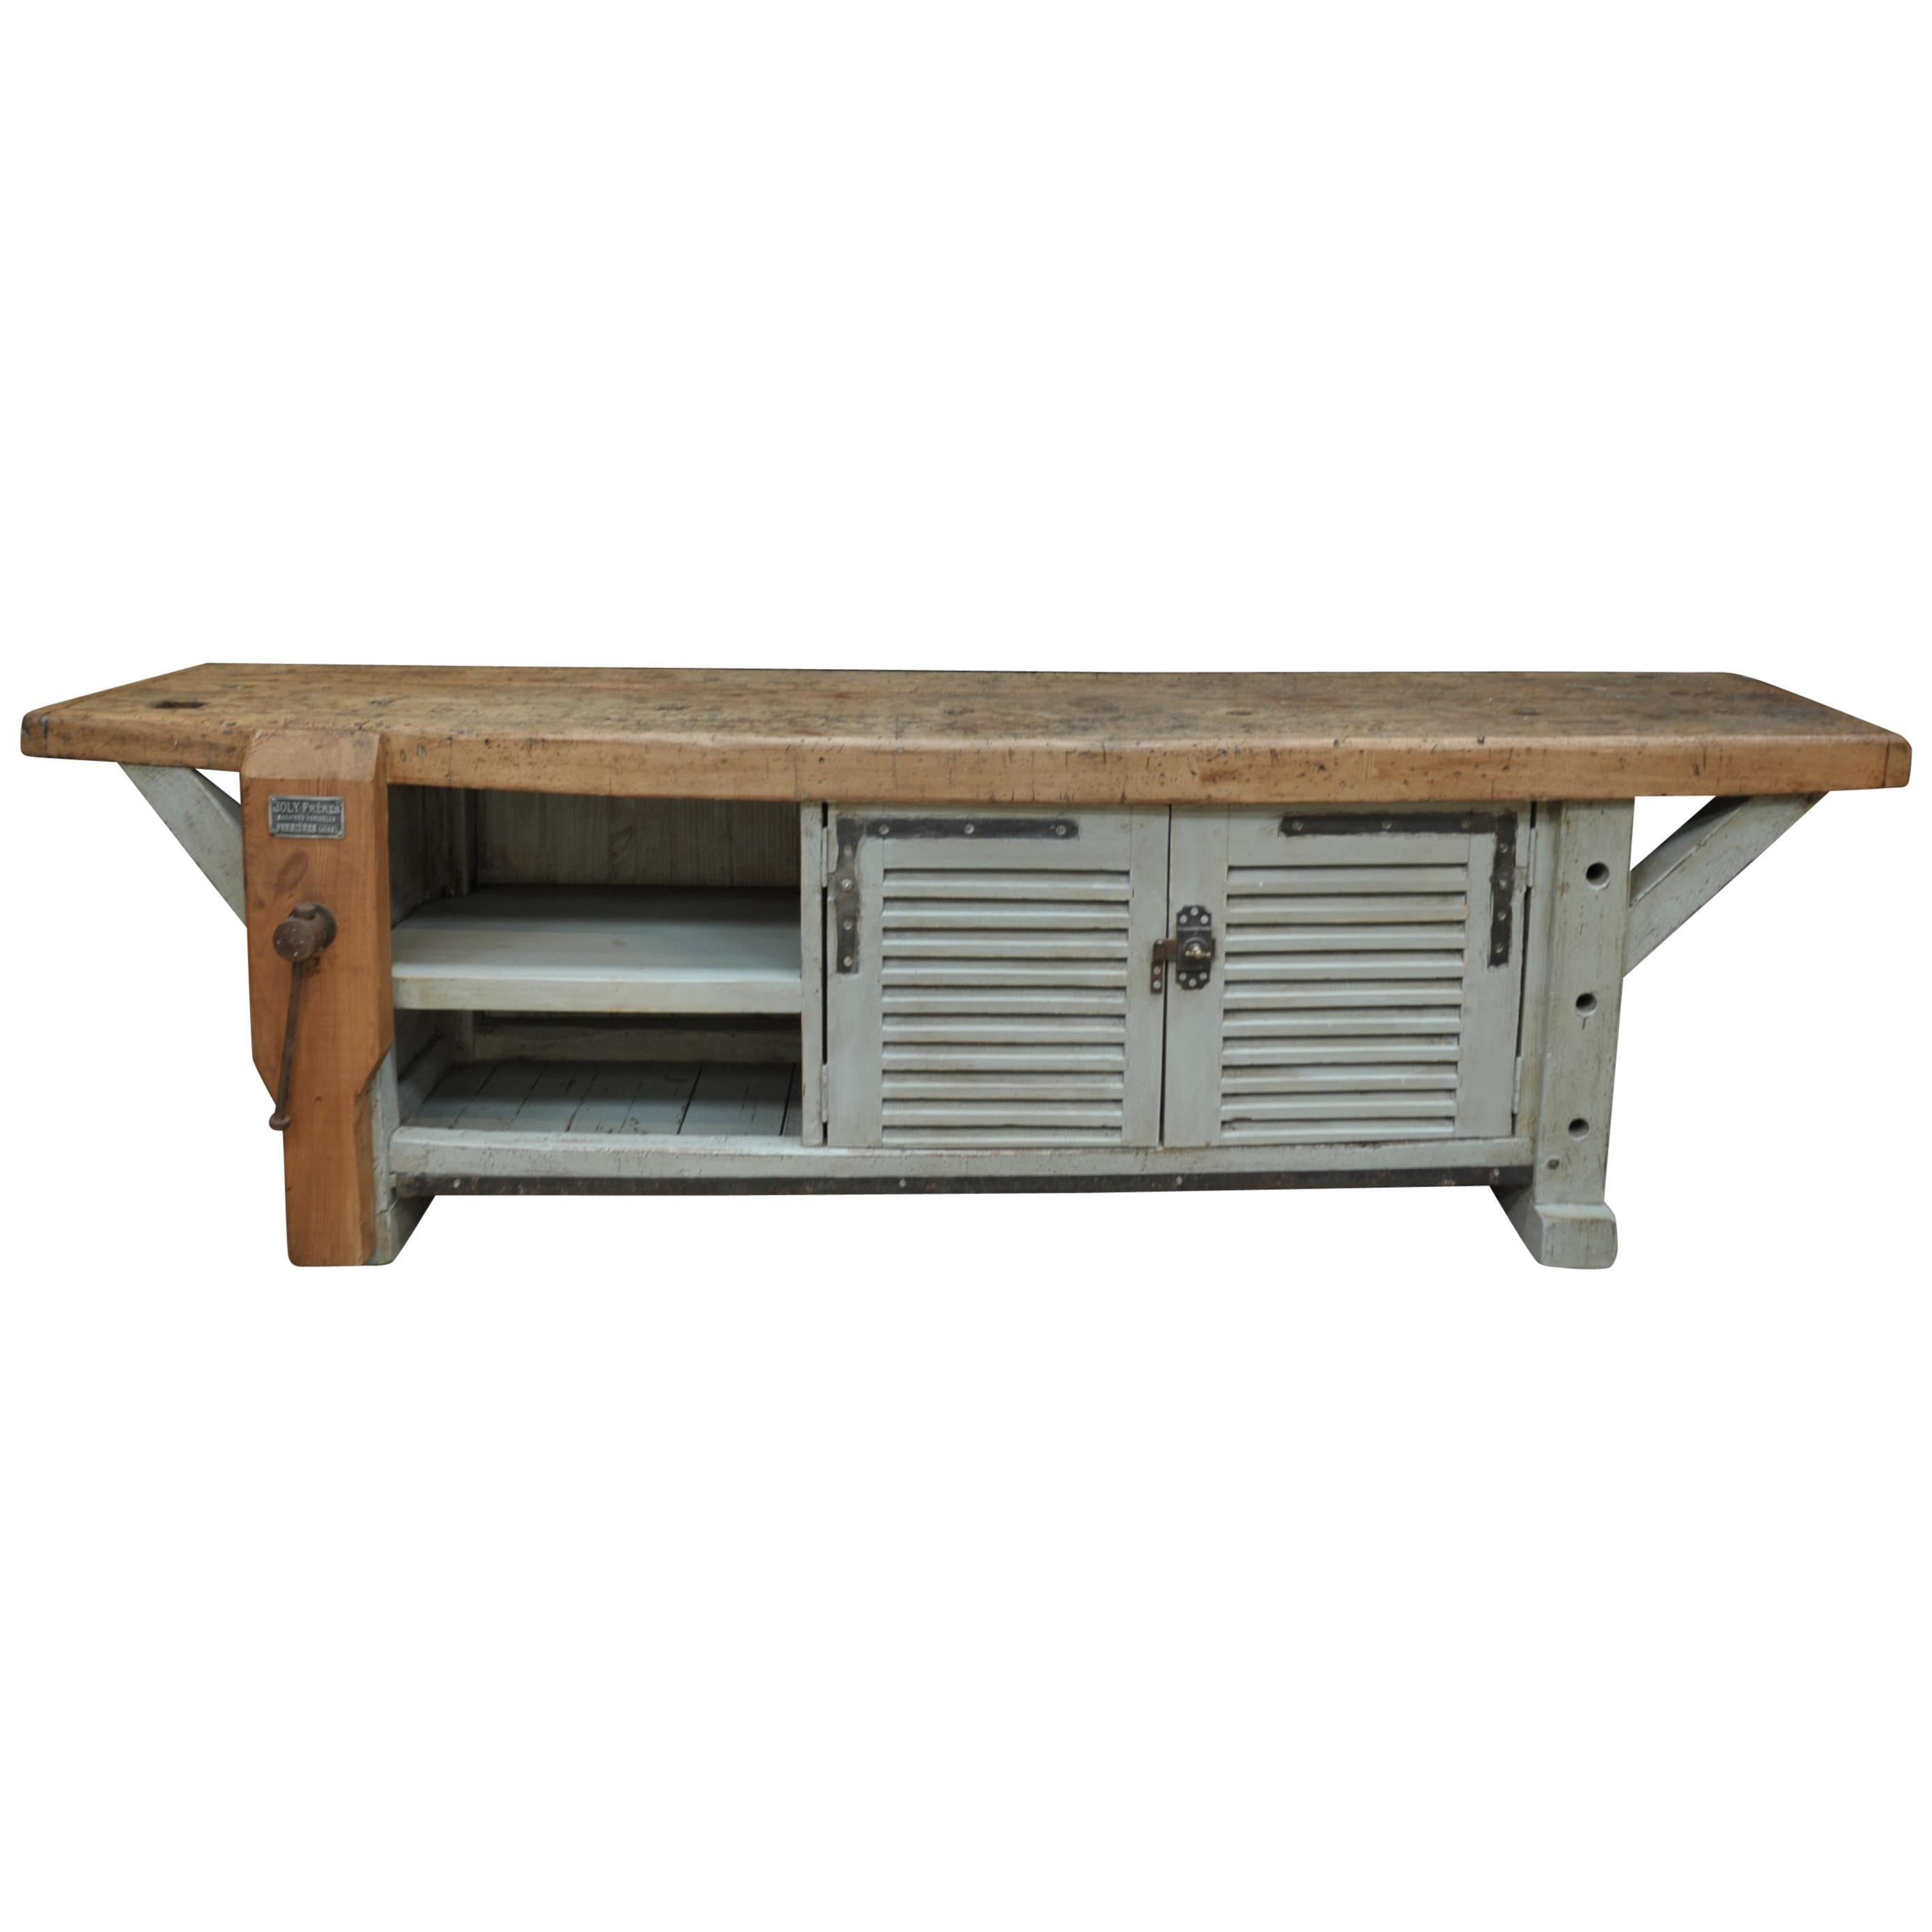 Long French 2 Doors Carpenter work Bench Cabinet, circa 1930